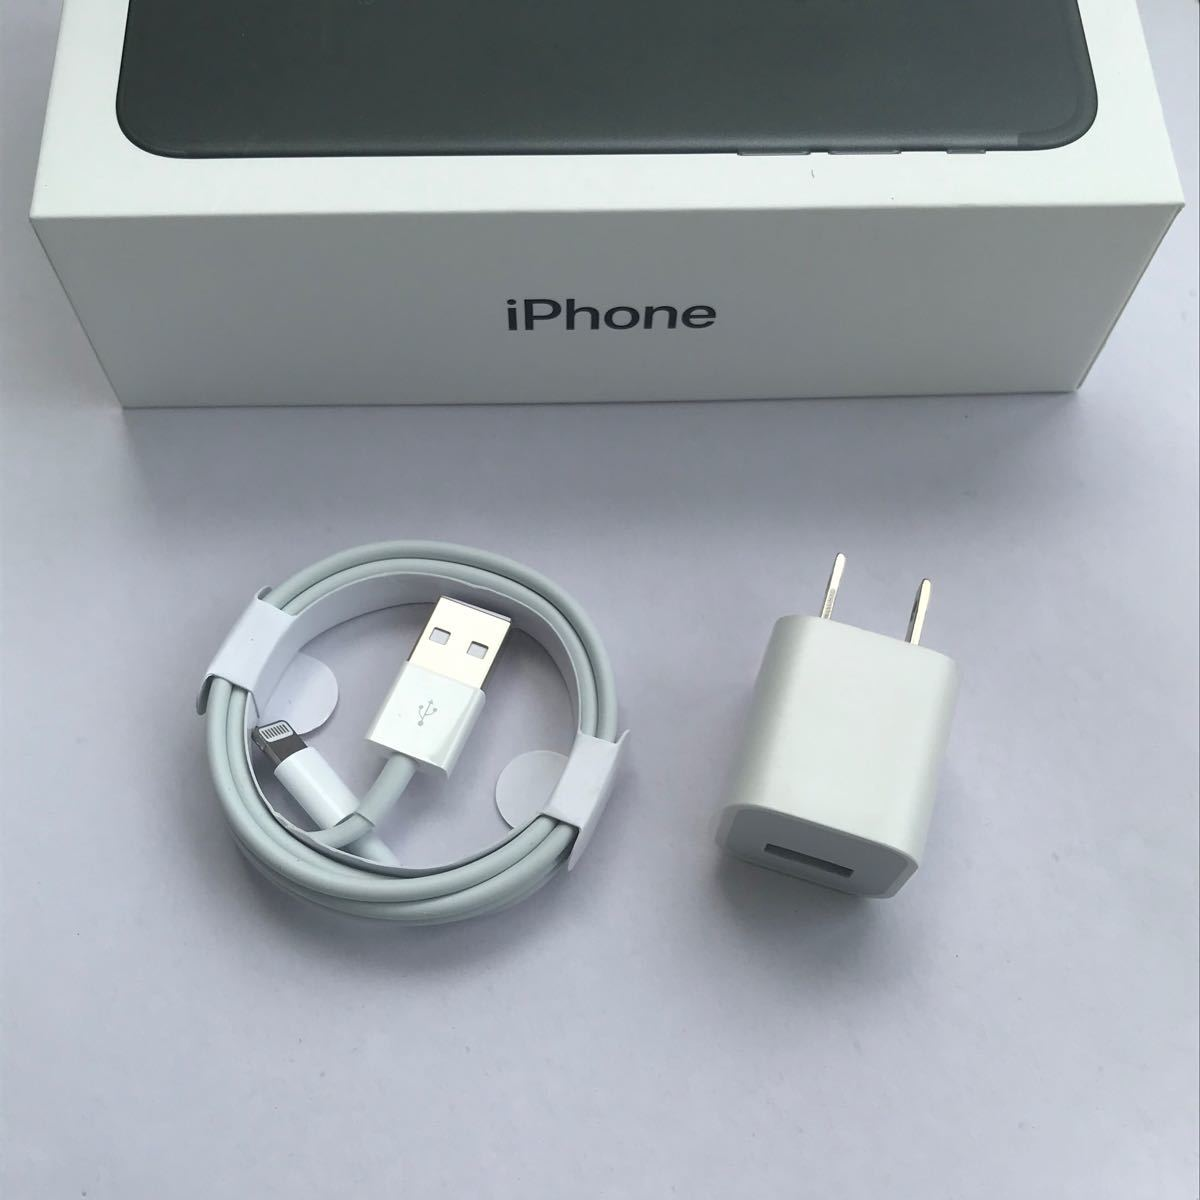 iPhone ライトニングケーブル 充電器 セット